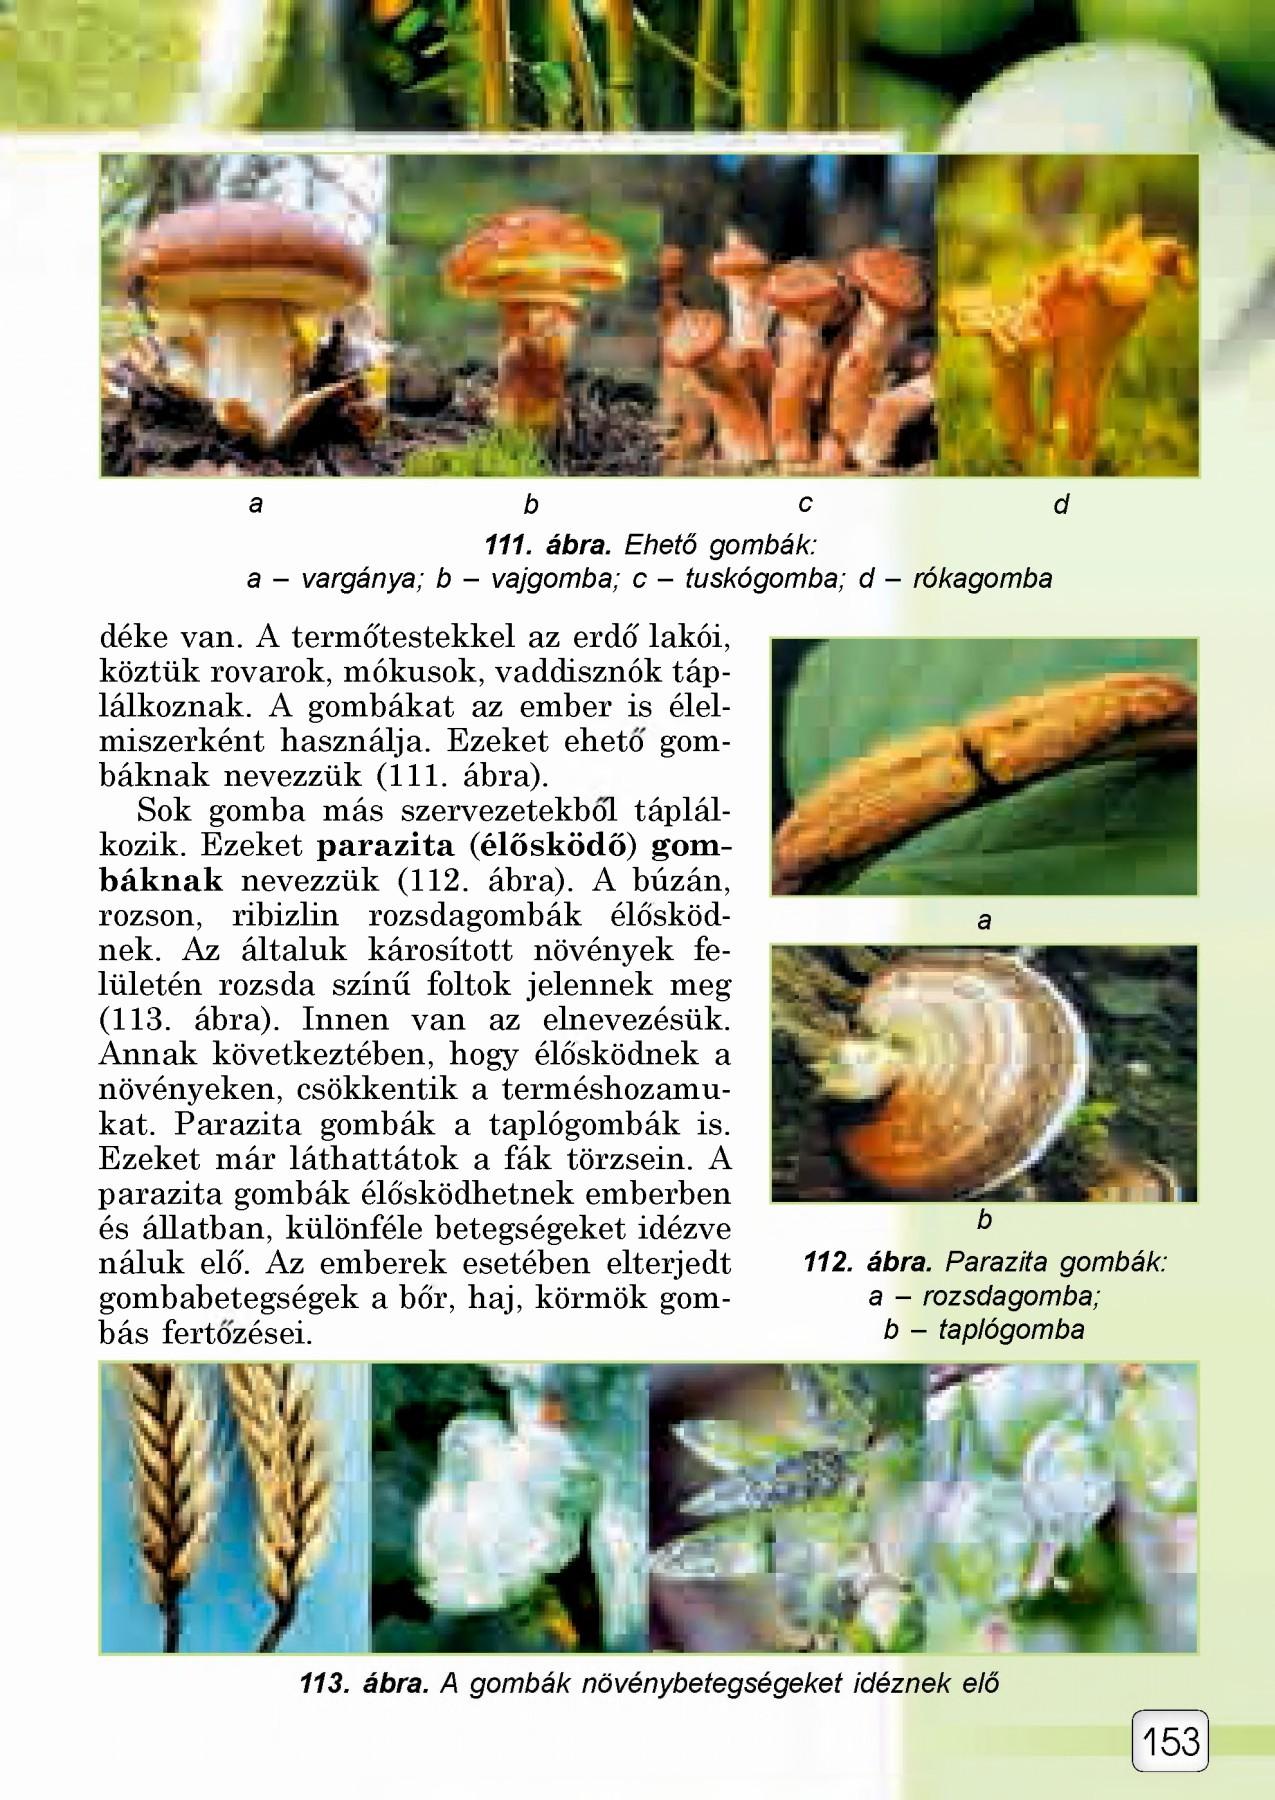 három gomba parazita)